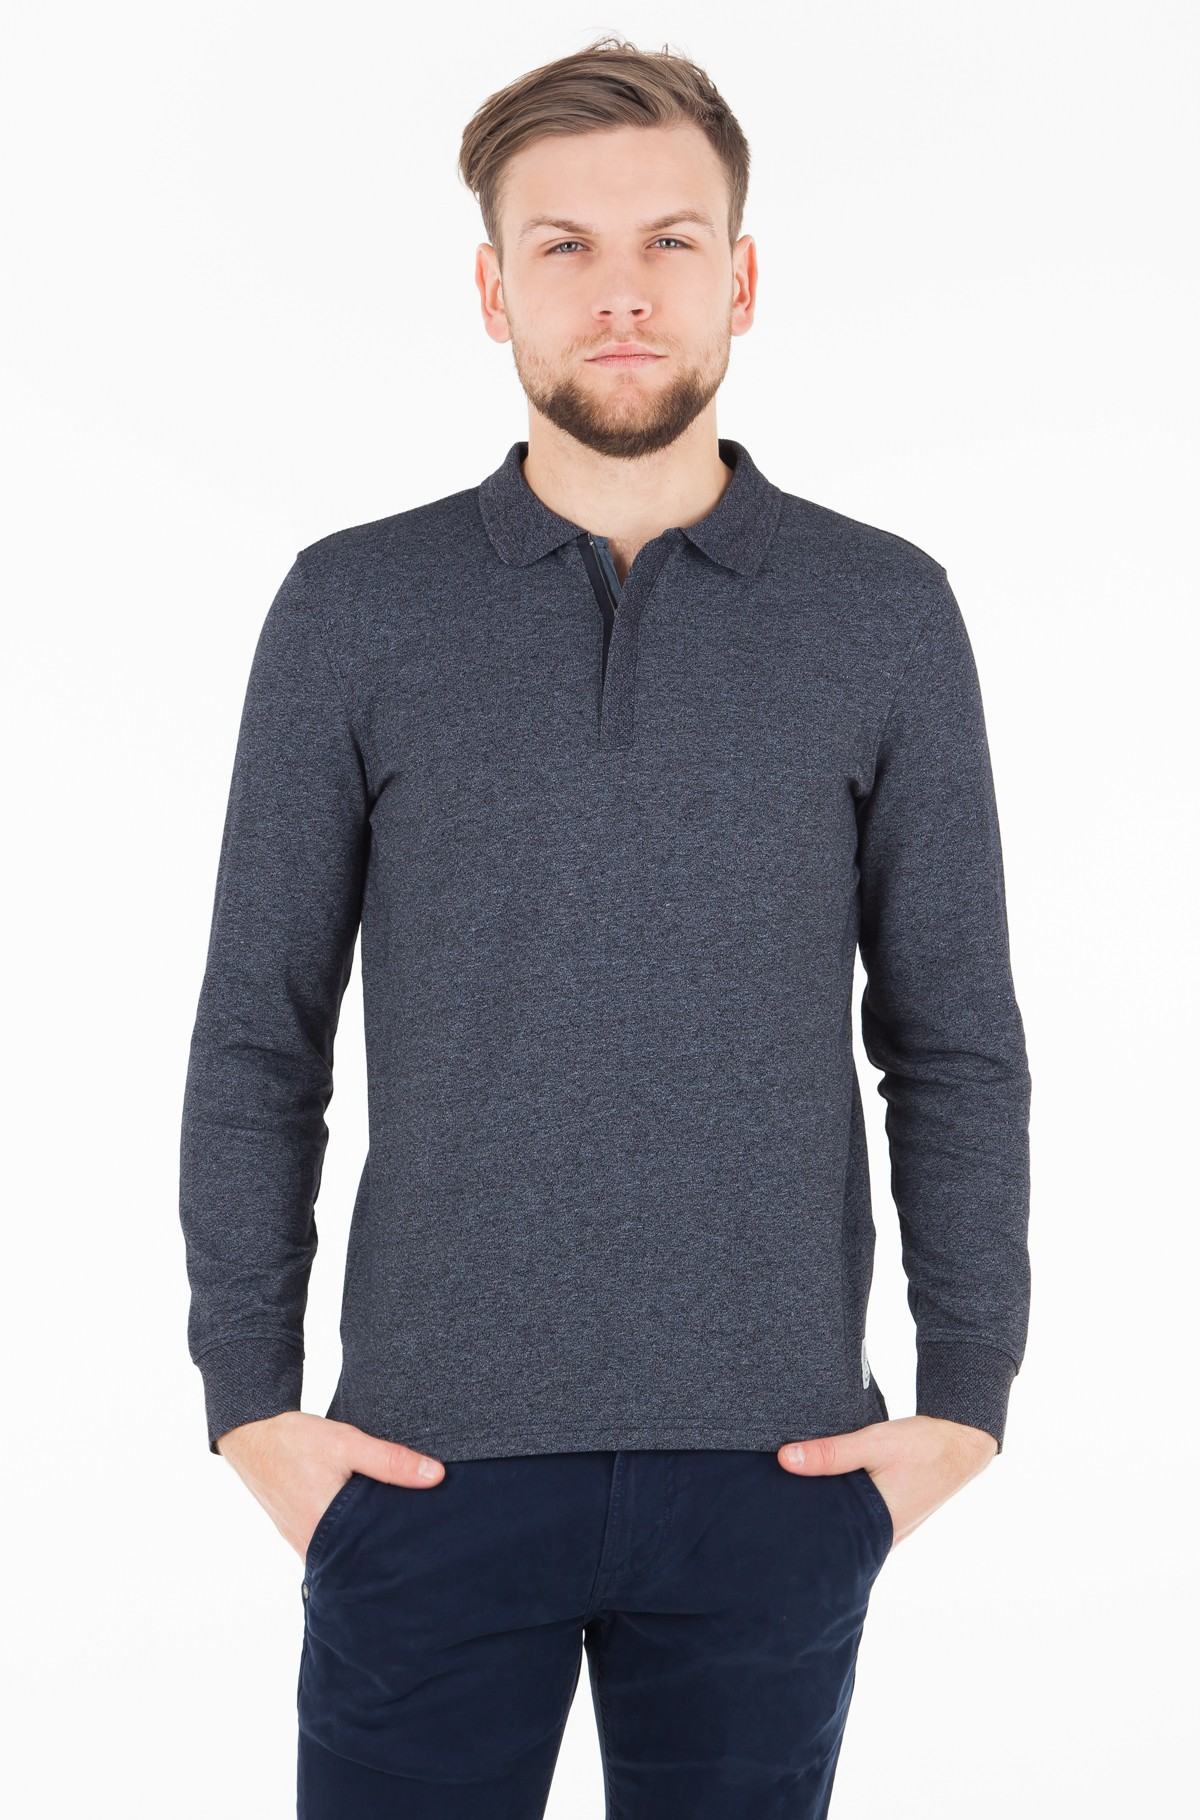 Polo marškinėliai ilgomis rankovėmis 1006057-full-1